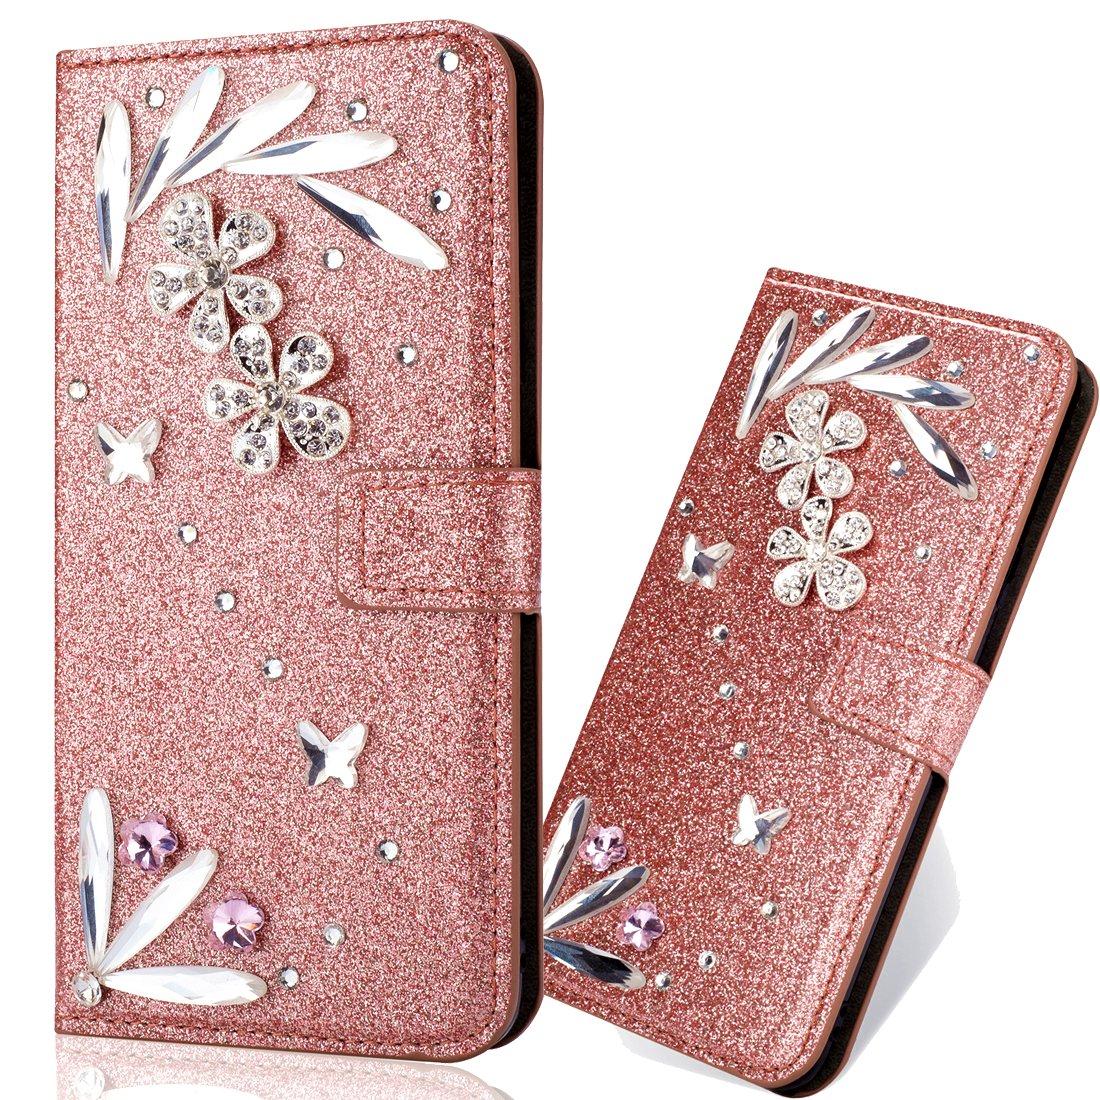 Vicbey Leder Bling Folio Sparkle Glitzer Strass Diamant f/ür Samsung A9 2018